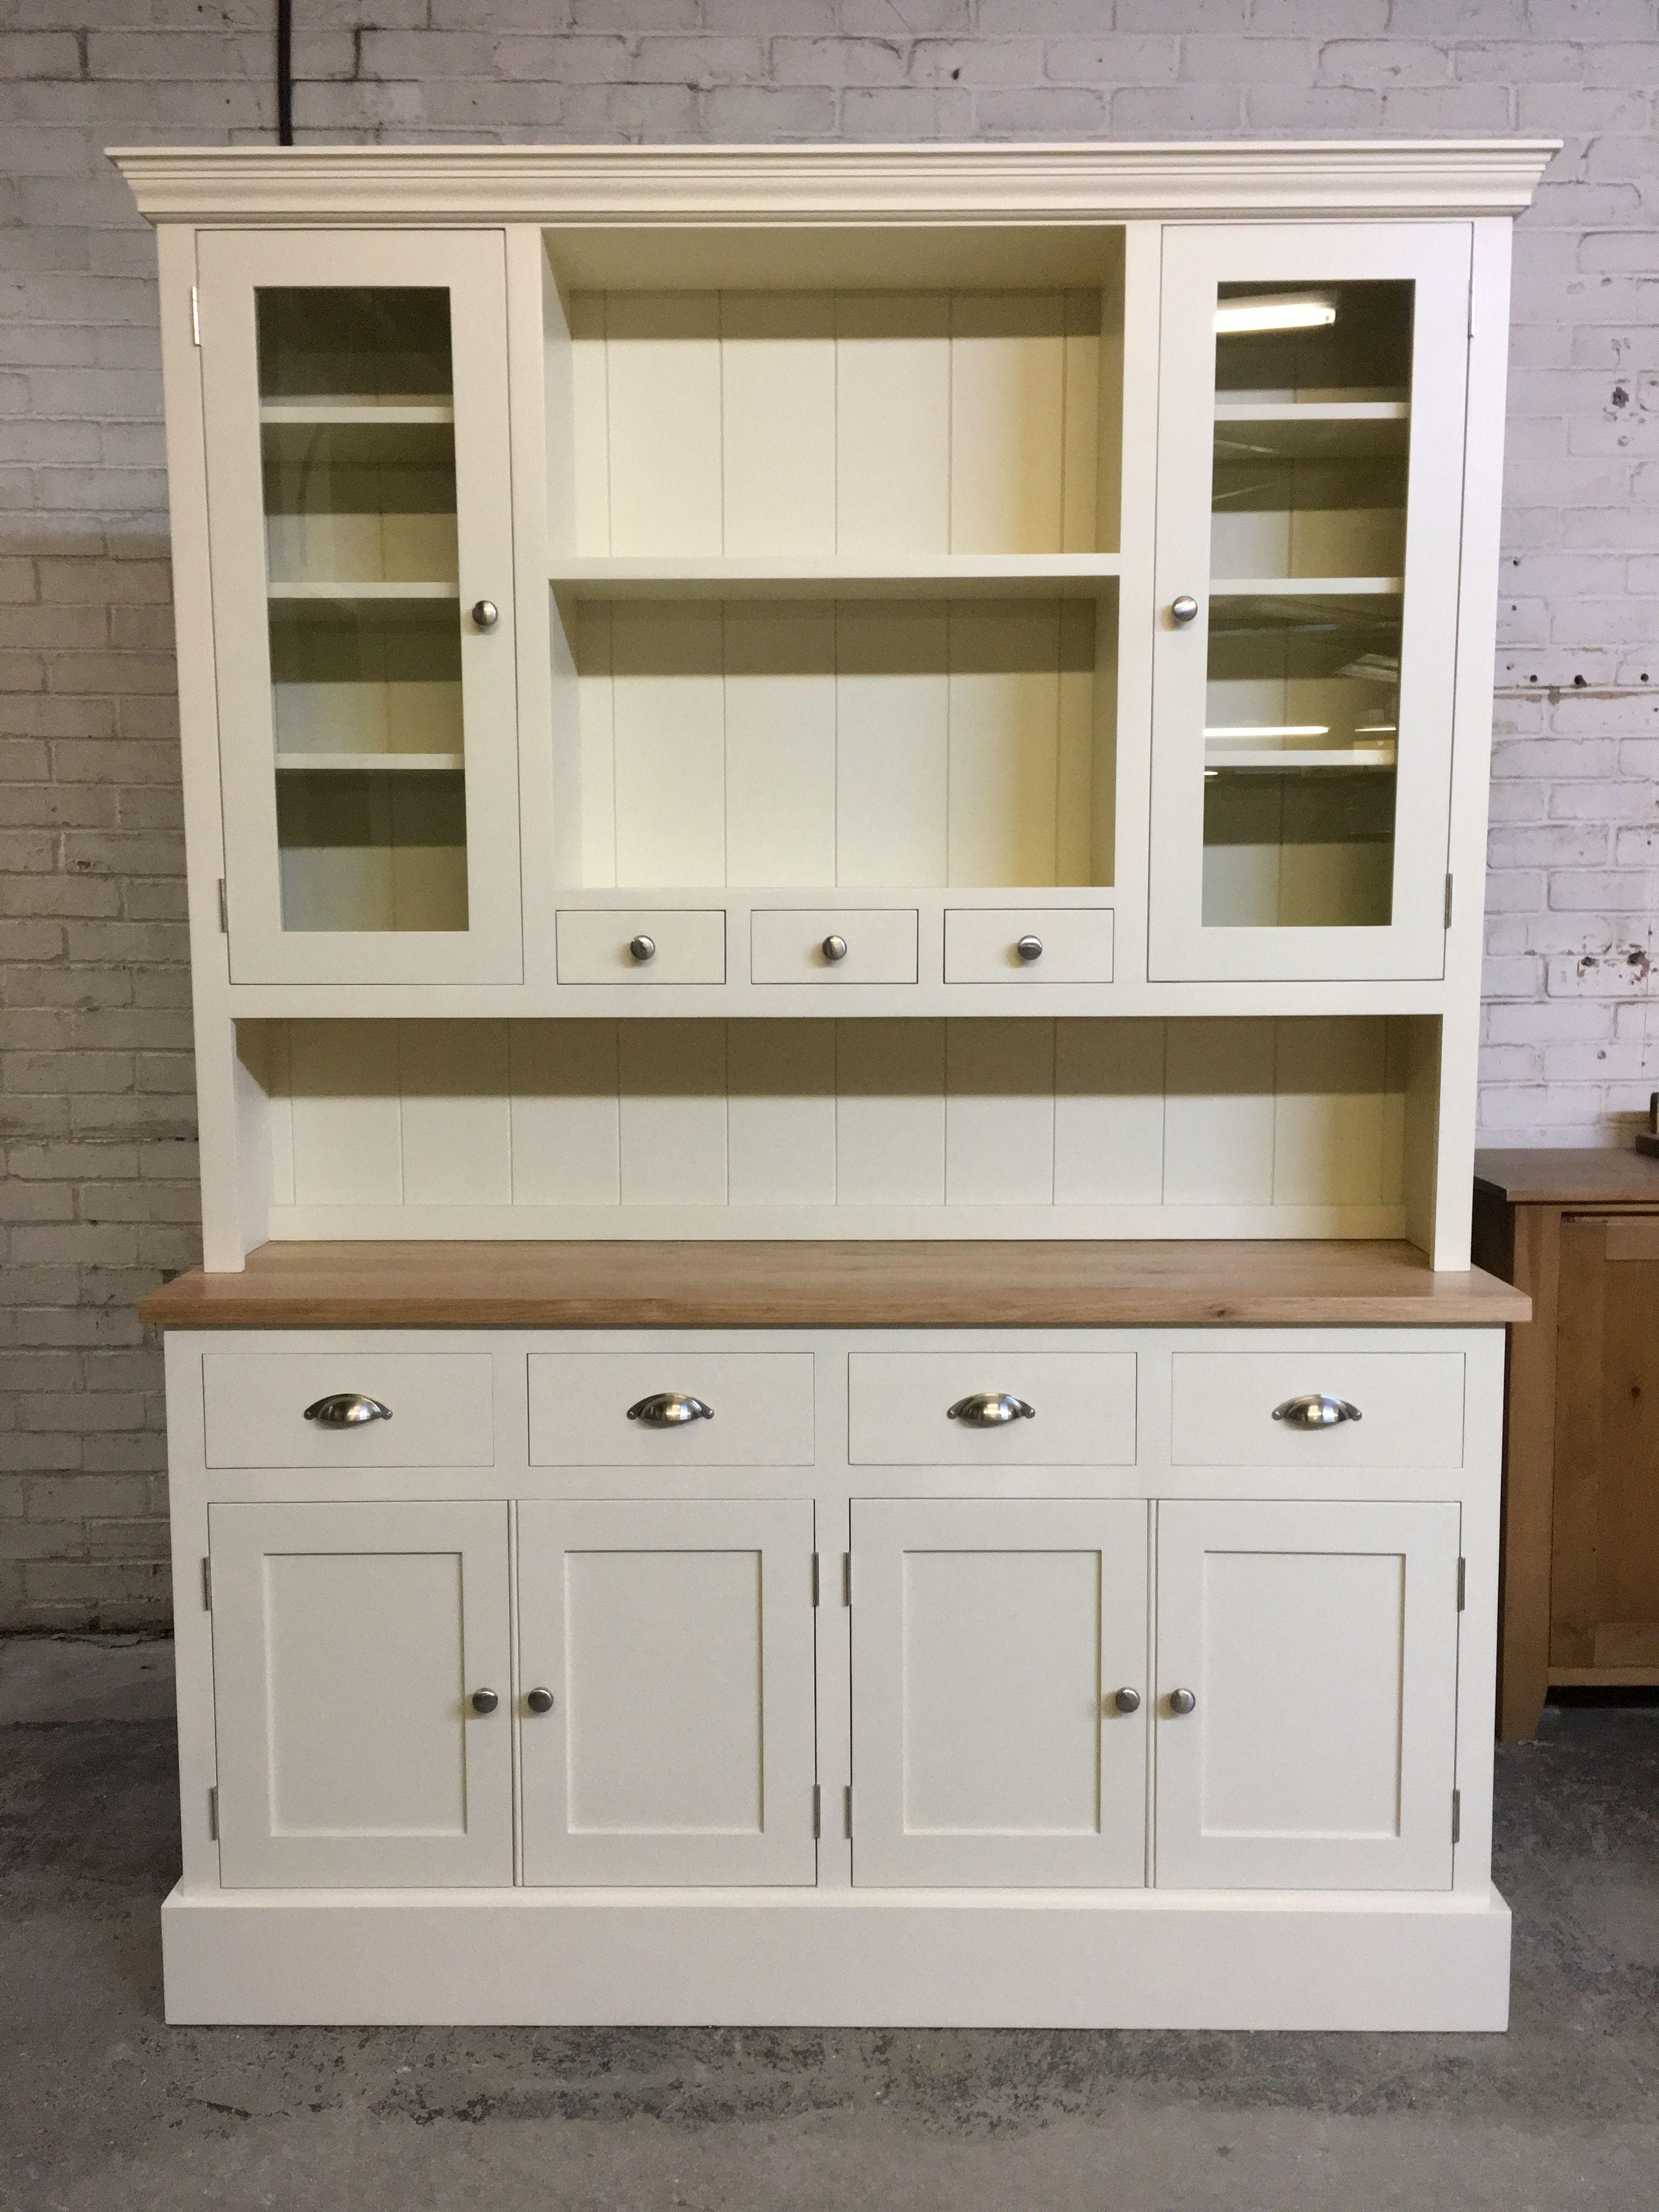 This Glazed Spice Dresser Was Painted F B Wimbourne White Www Cobwebsfurniture Co Uk Kitchen Kitchen Cabinets Interior Design